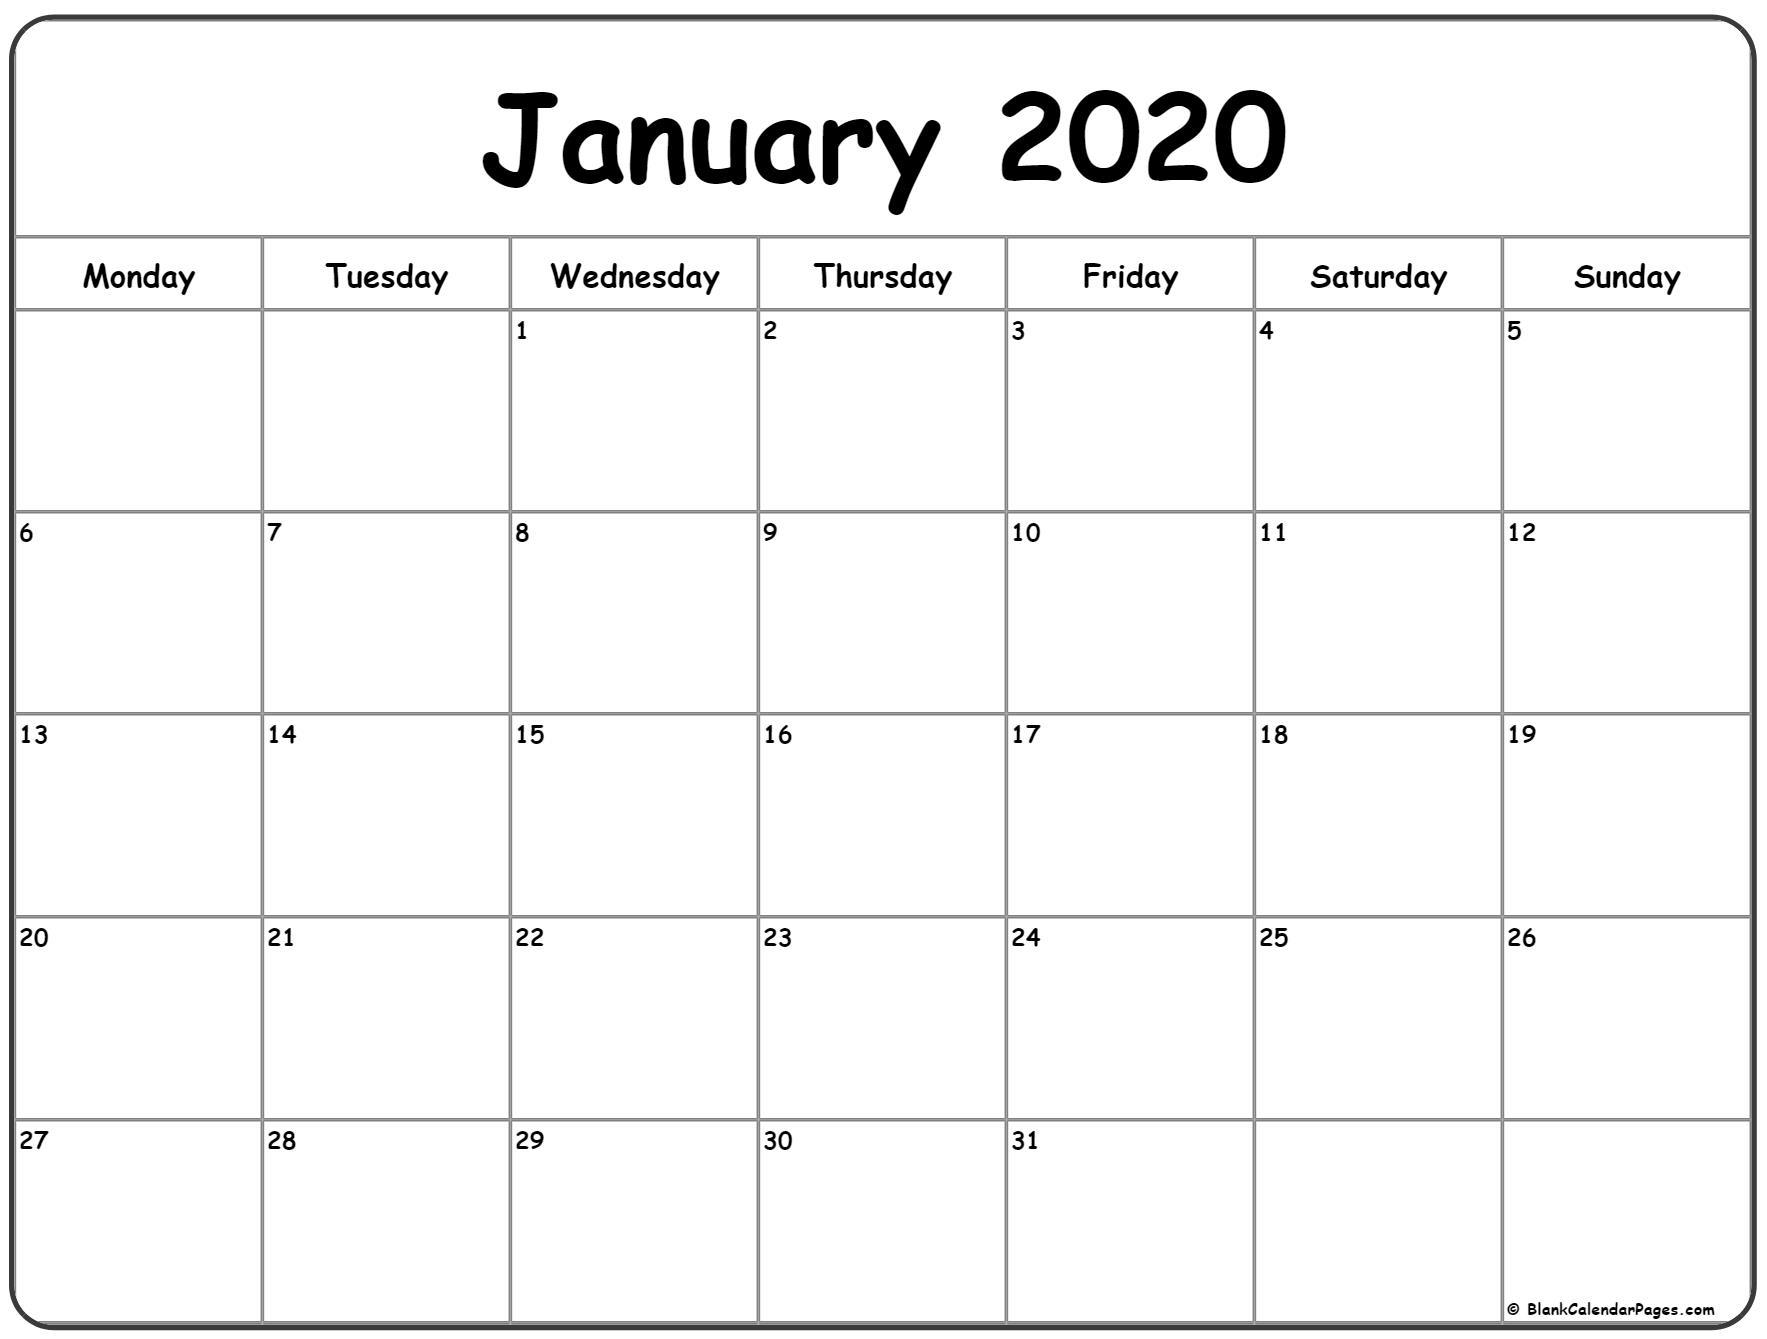 January 2020 Monday Calendar | Monday To Sunday with regard to Calendar That Starts On Monday